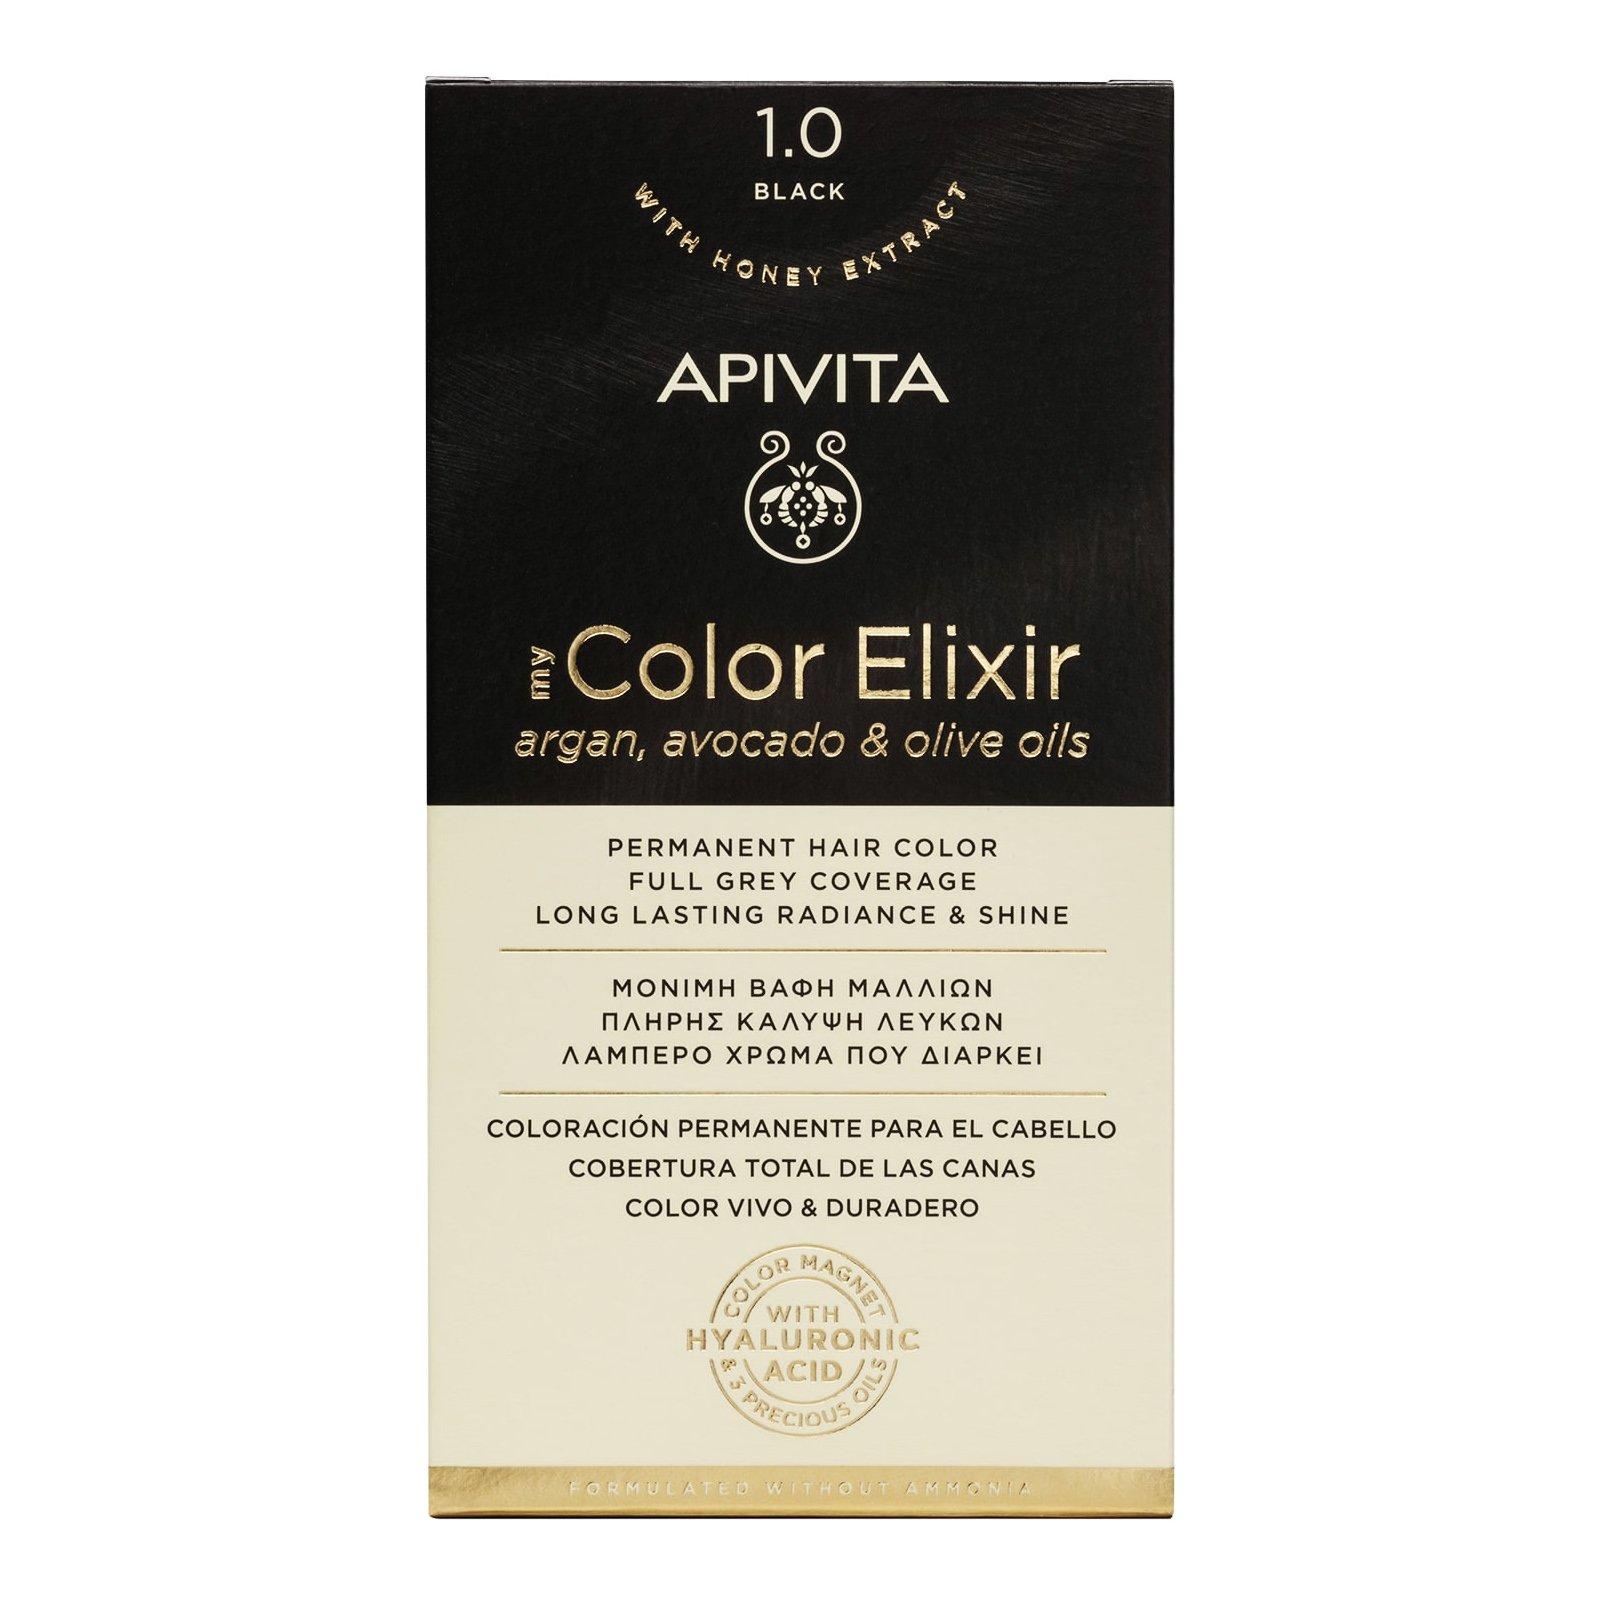 Apivita My Color Elixir Μόνιμη Βαφή Μαλλιών με Καινοτόμο Σύστημα Color Magnet που Σταθεροποιεί και Σφραγίζει το Χρώμα στην Τρίχα – N 1.0 ΦΥΣΙΚΟ ΜΑΥΡΟ